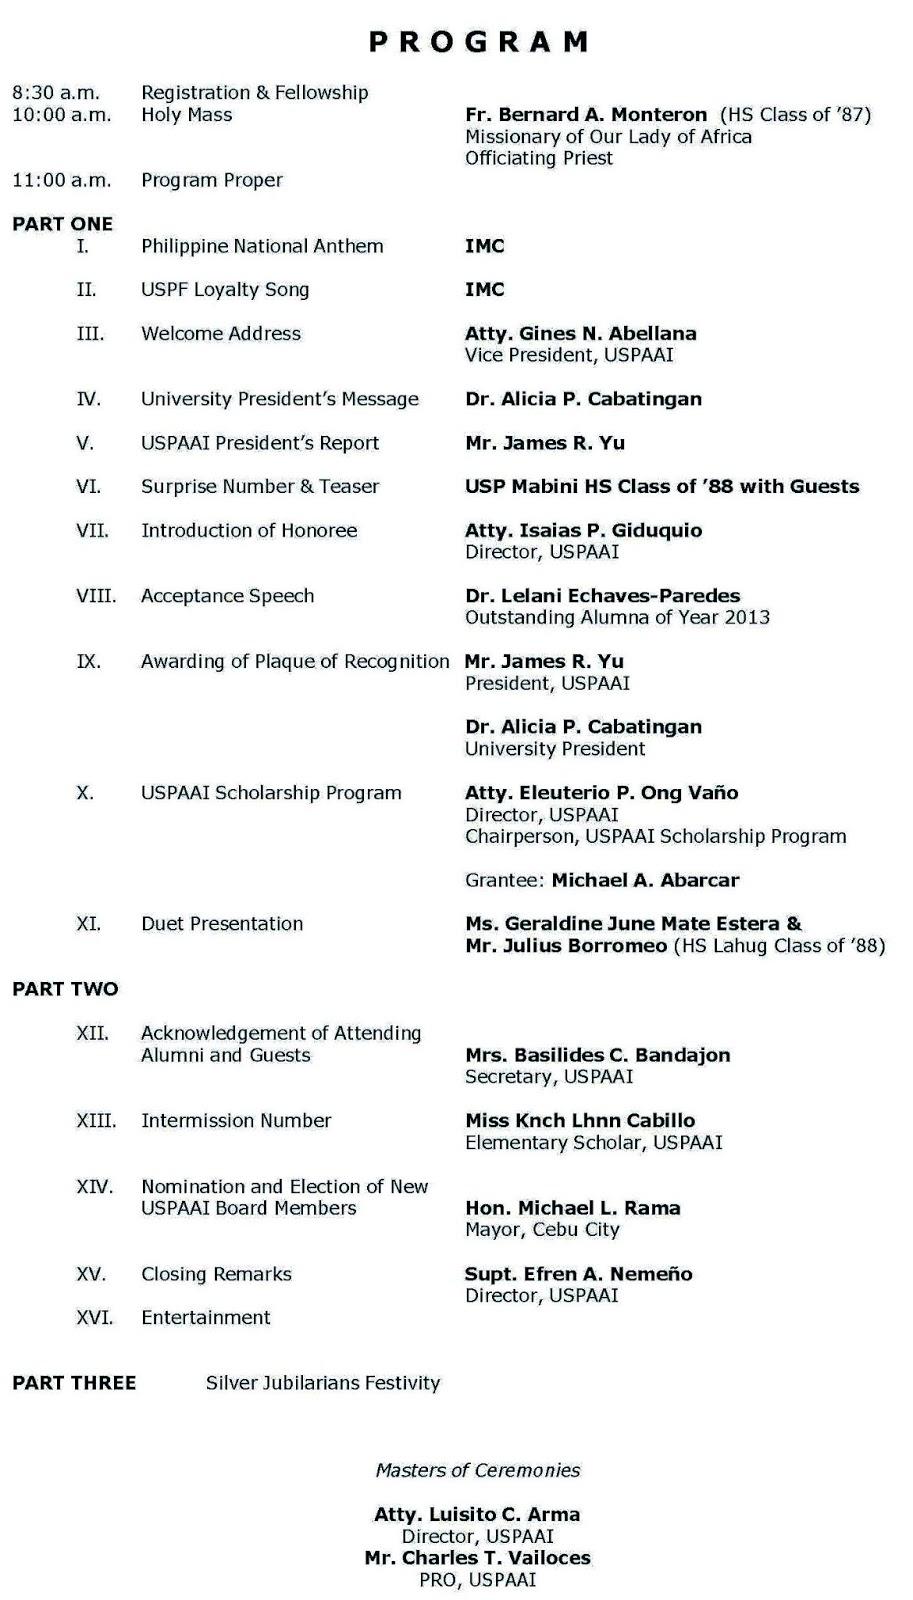 USPian Alumni Newsletter: Grand Alumni Homecoming 2013